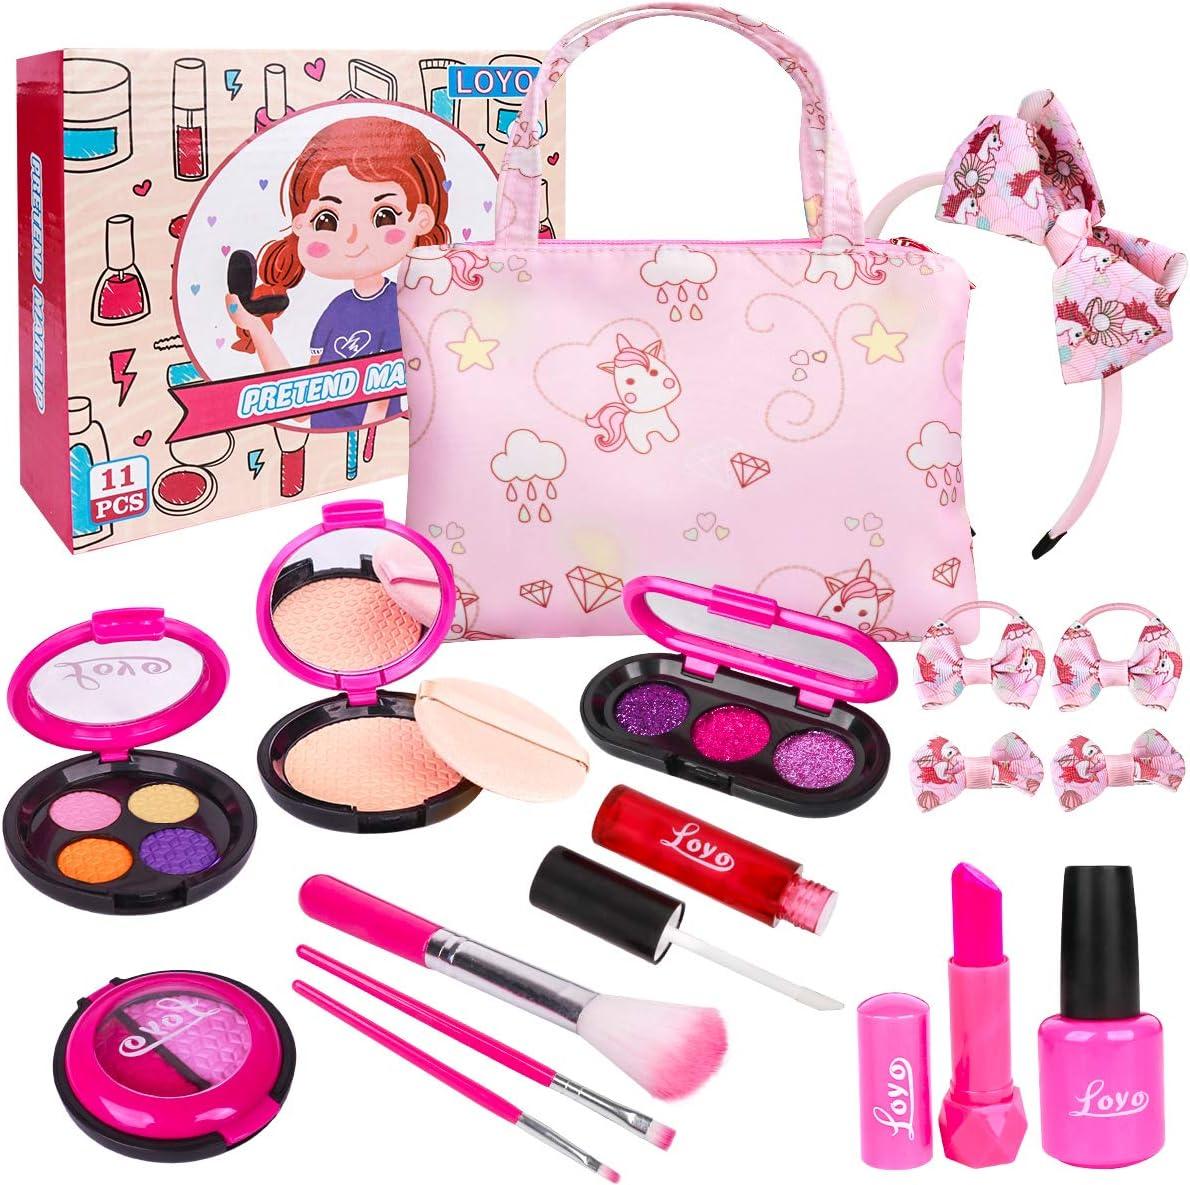 LOYO Girls Pretend Play Makeup Sets $12.74 Coupon